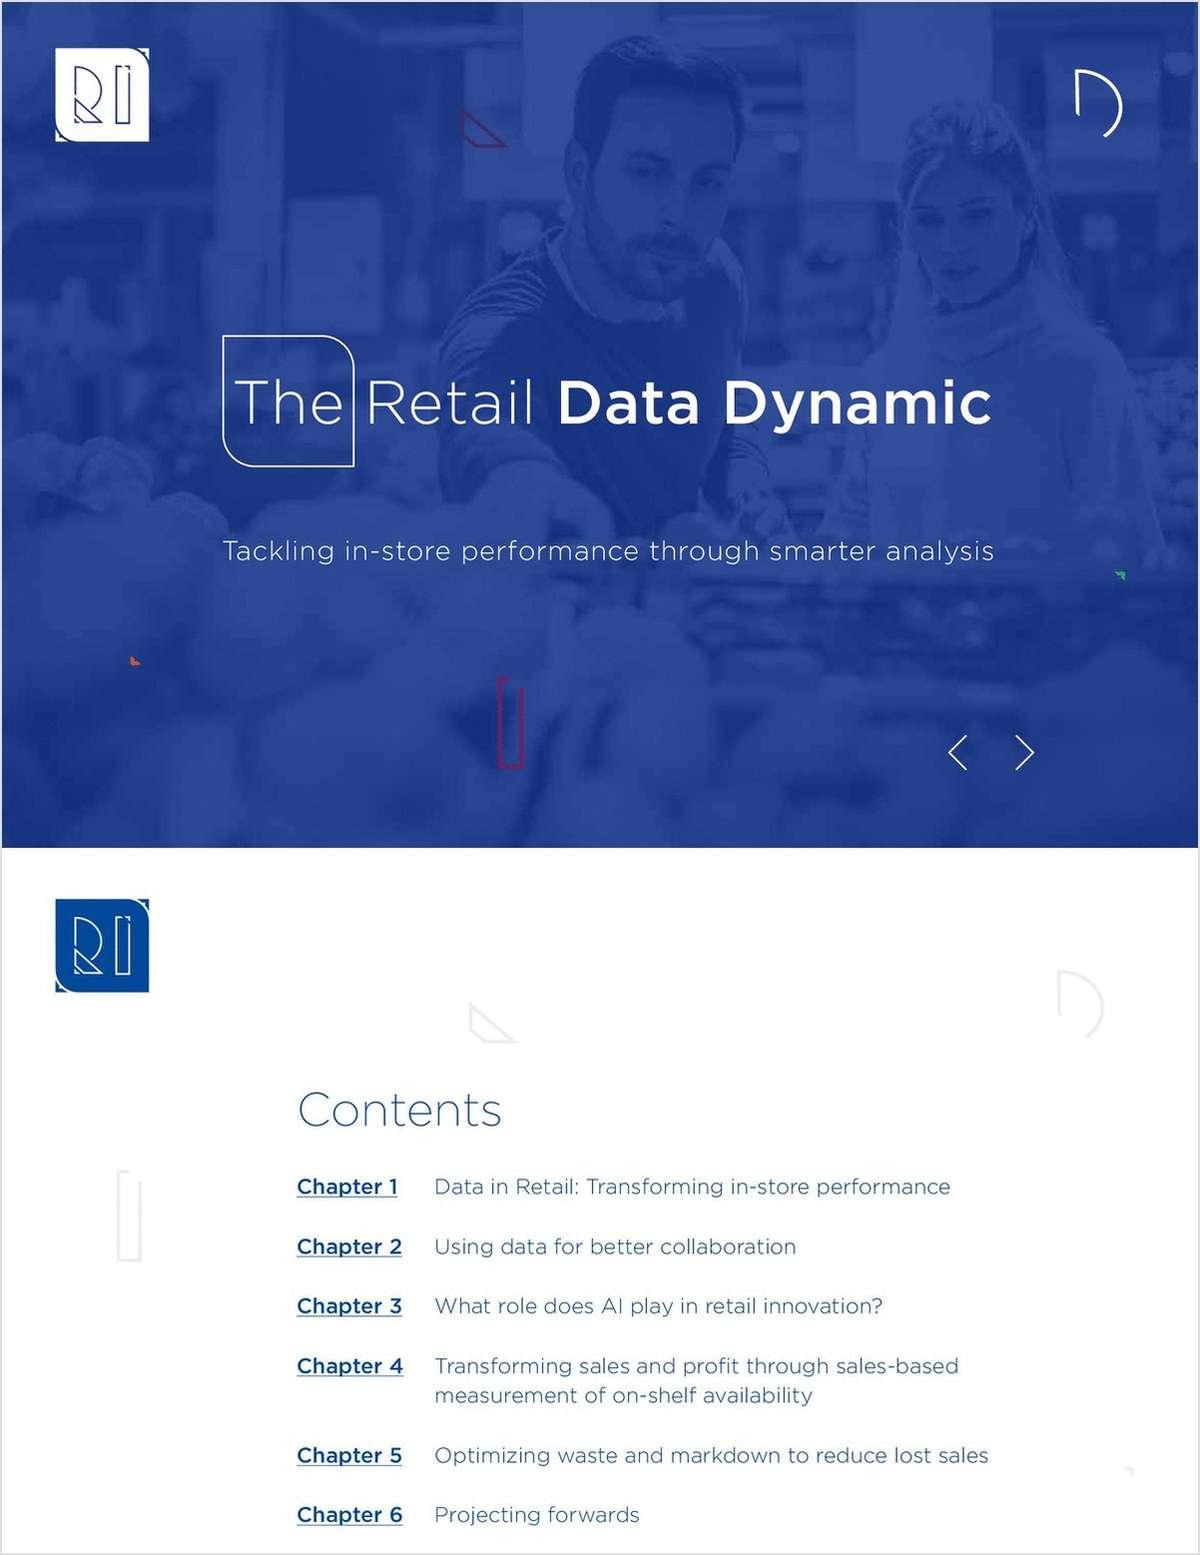 The Retail Data Dynamic